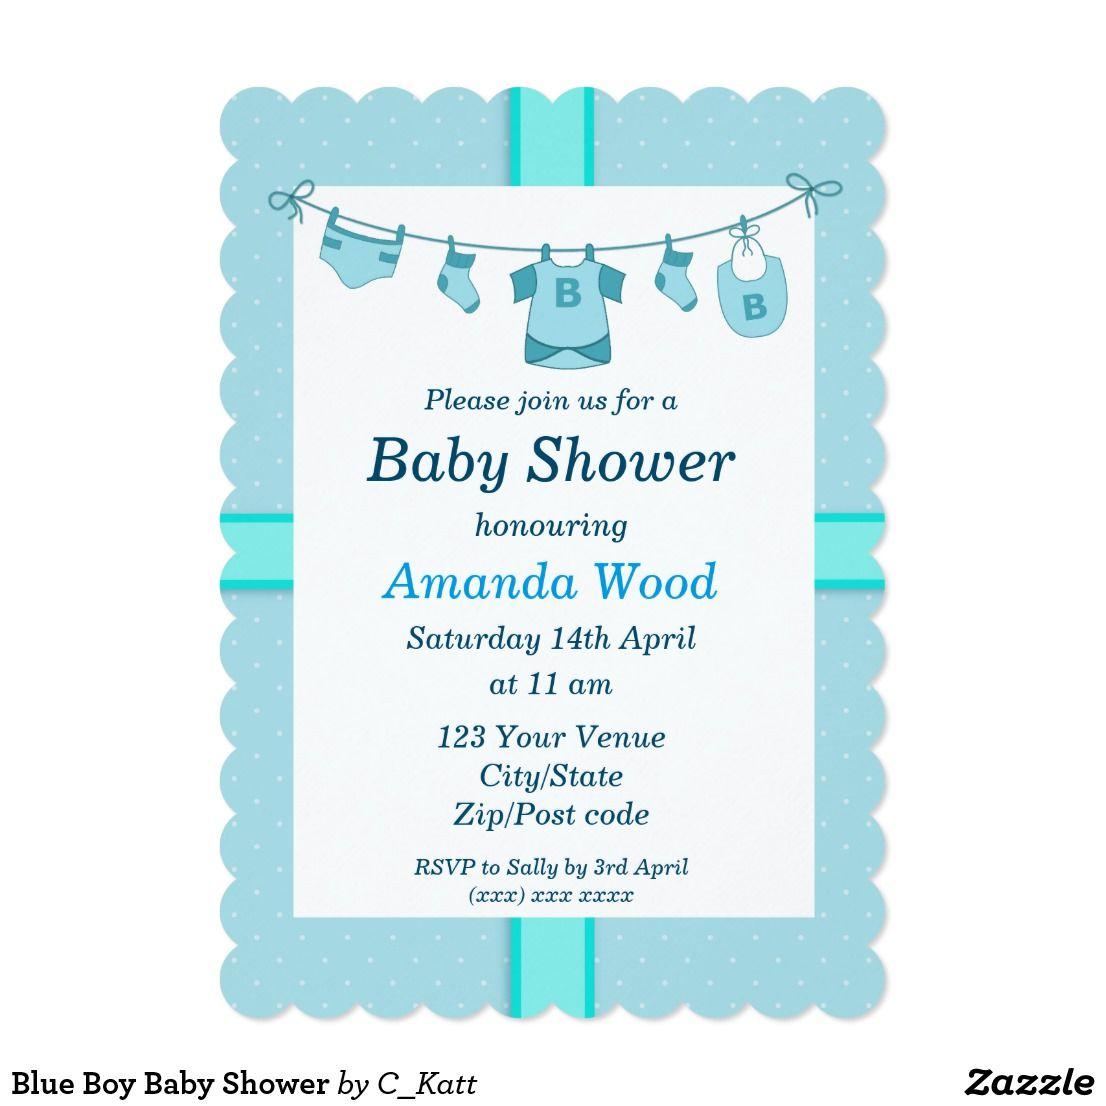 Blue Boy Baby Shower Invitation Zazzle Com Blue Baby Shower Invitations Boy Baby Shower Card Baby Shower Invitations For Boys